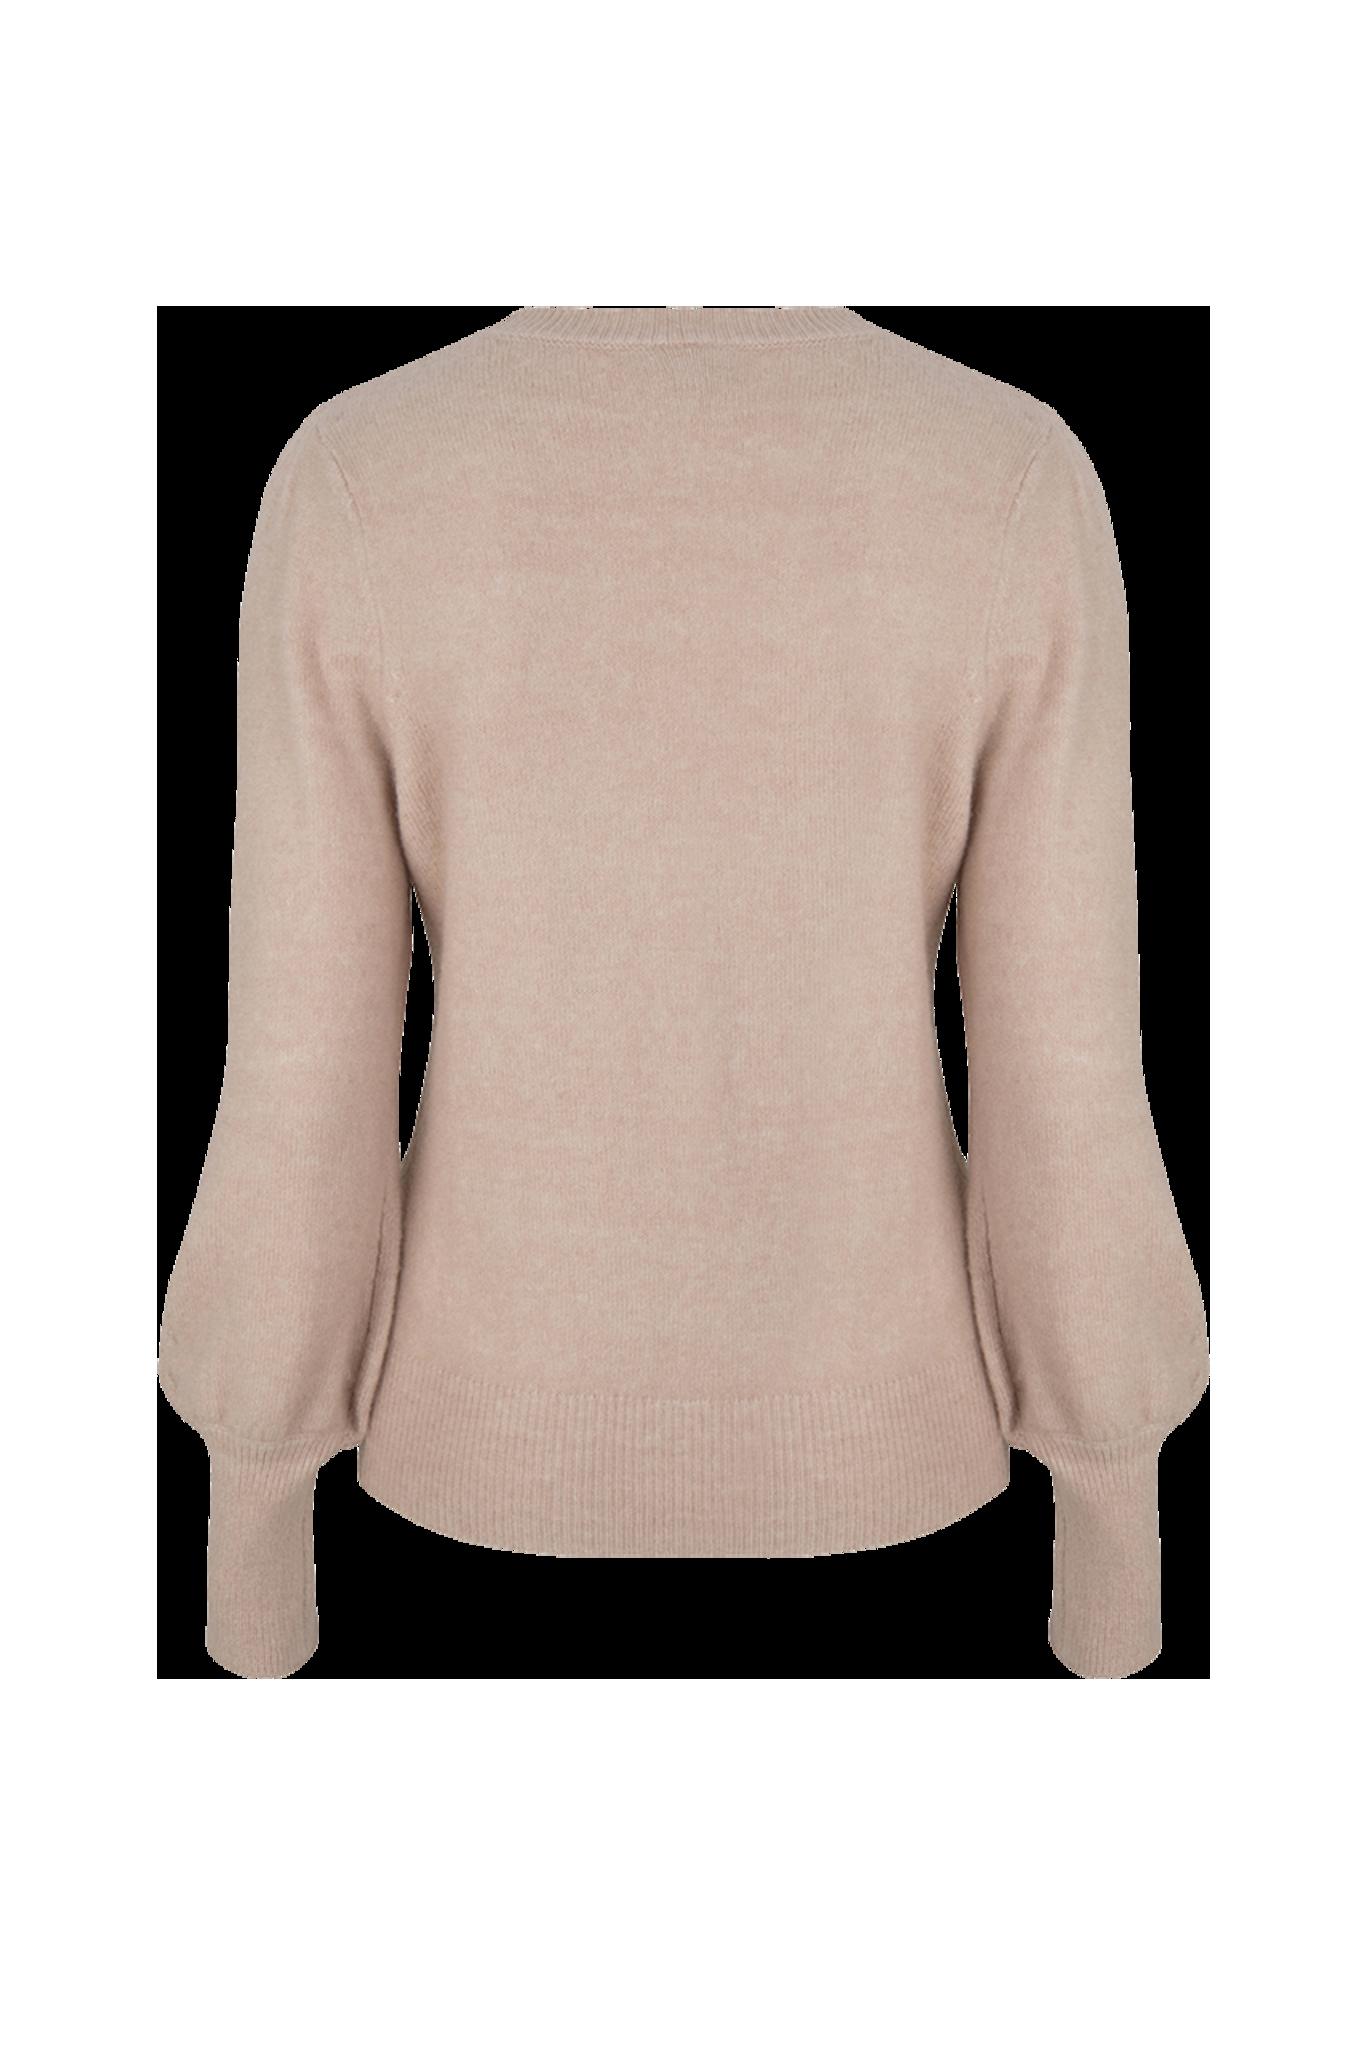 Kinsley Ajour Knit Sweater - Light Powder Rose L-4